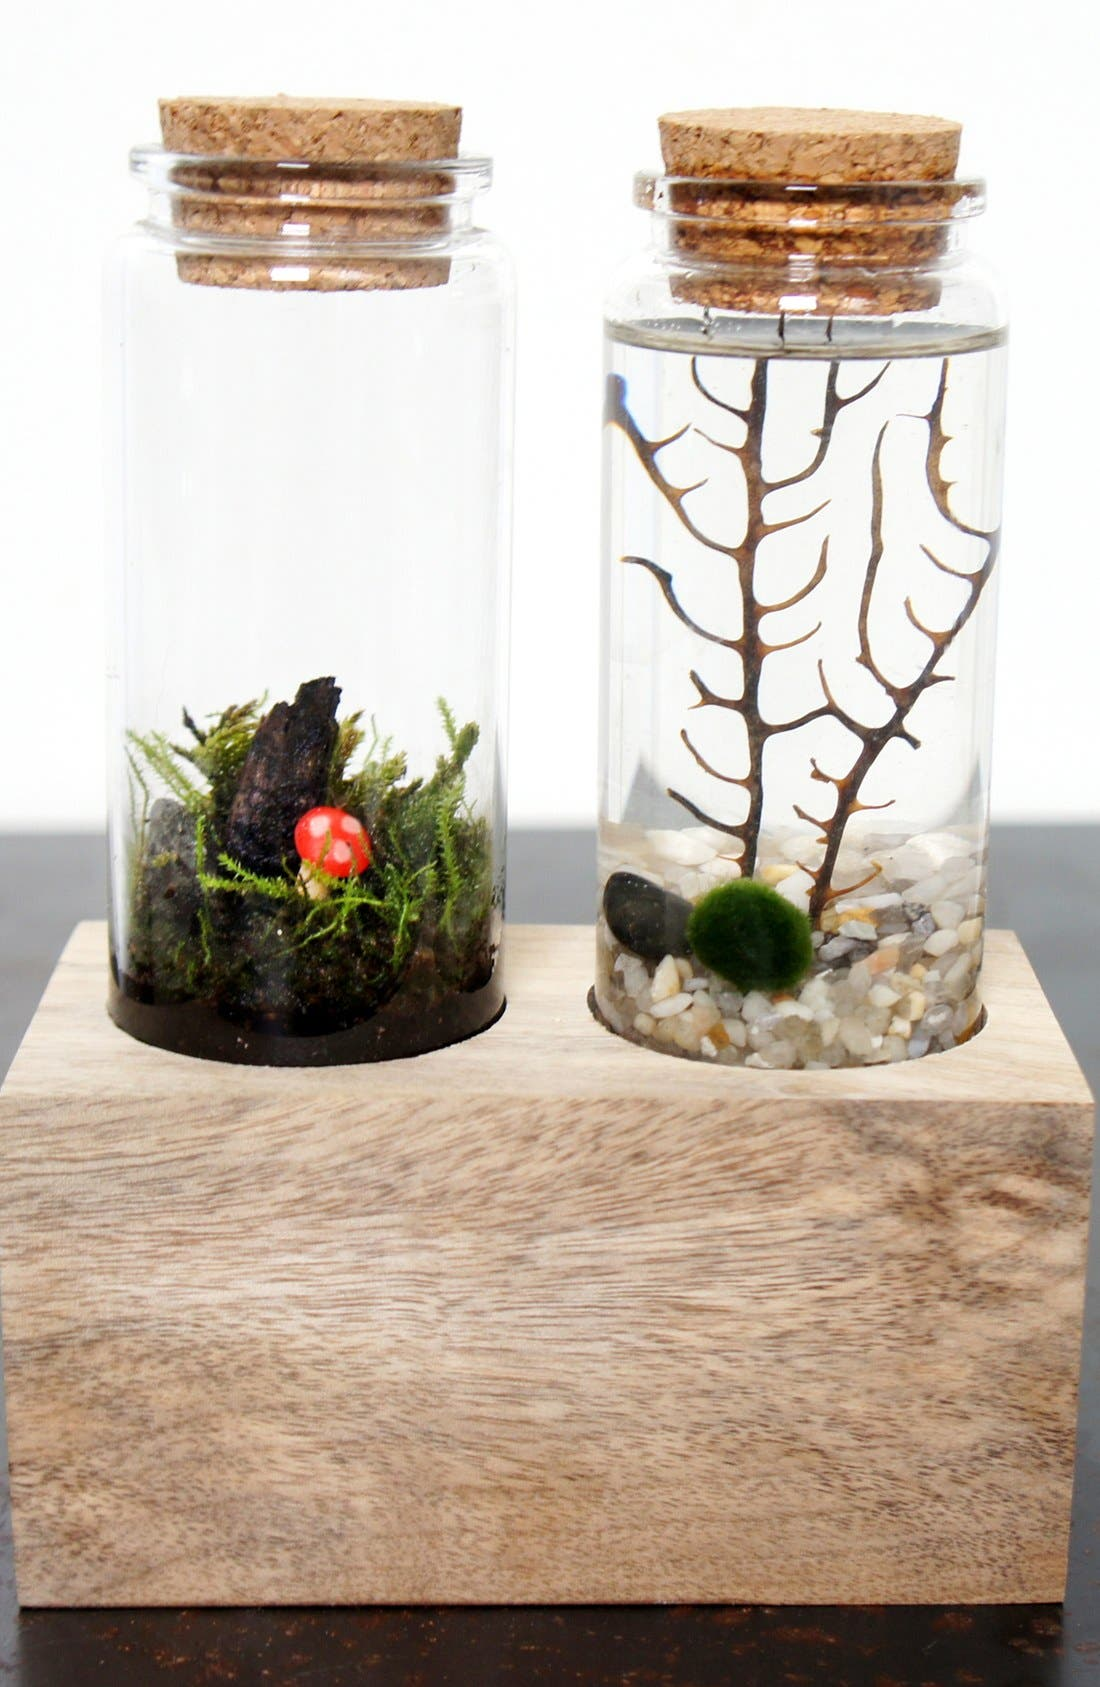 Alternate Image 1 Selected - Moss + Twigg Land & Sea Terrarium Set